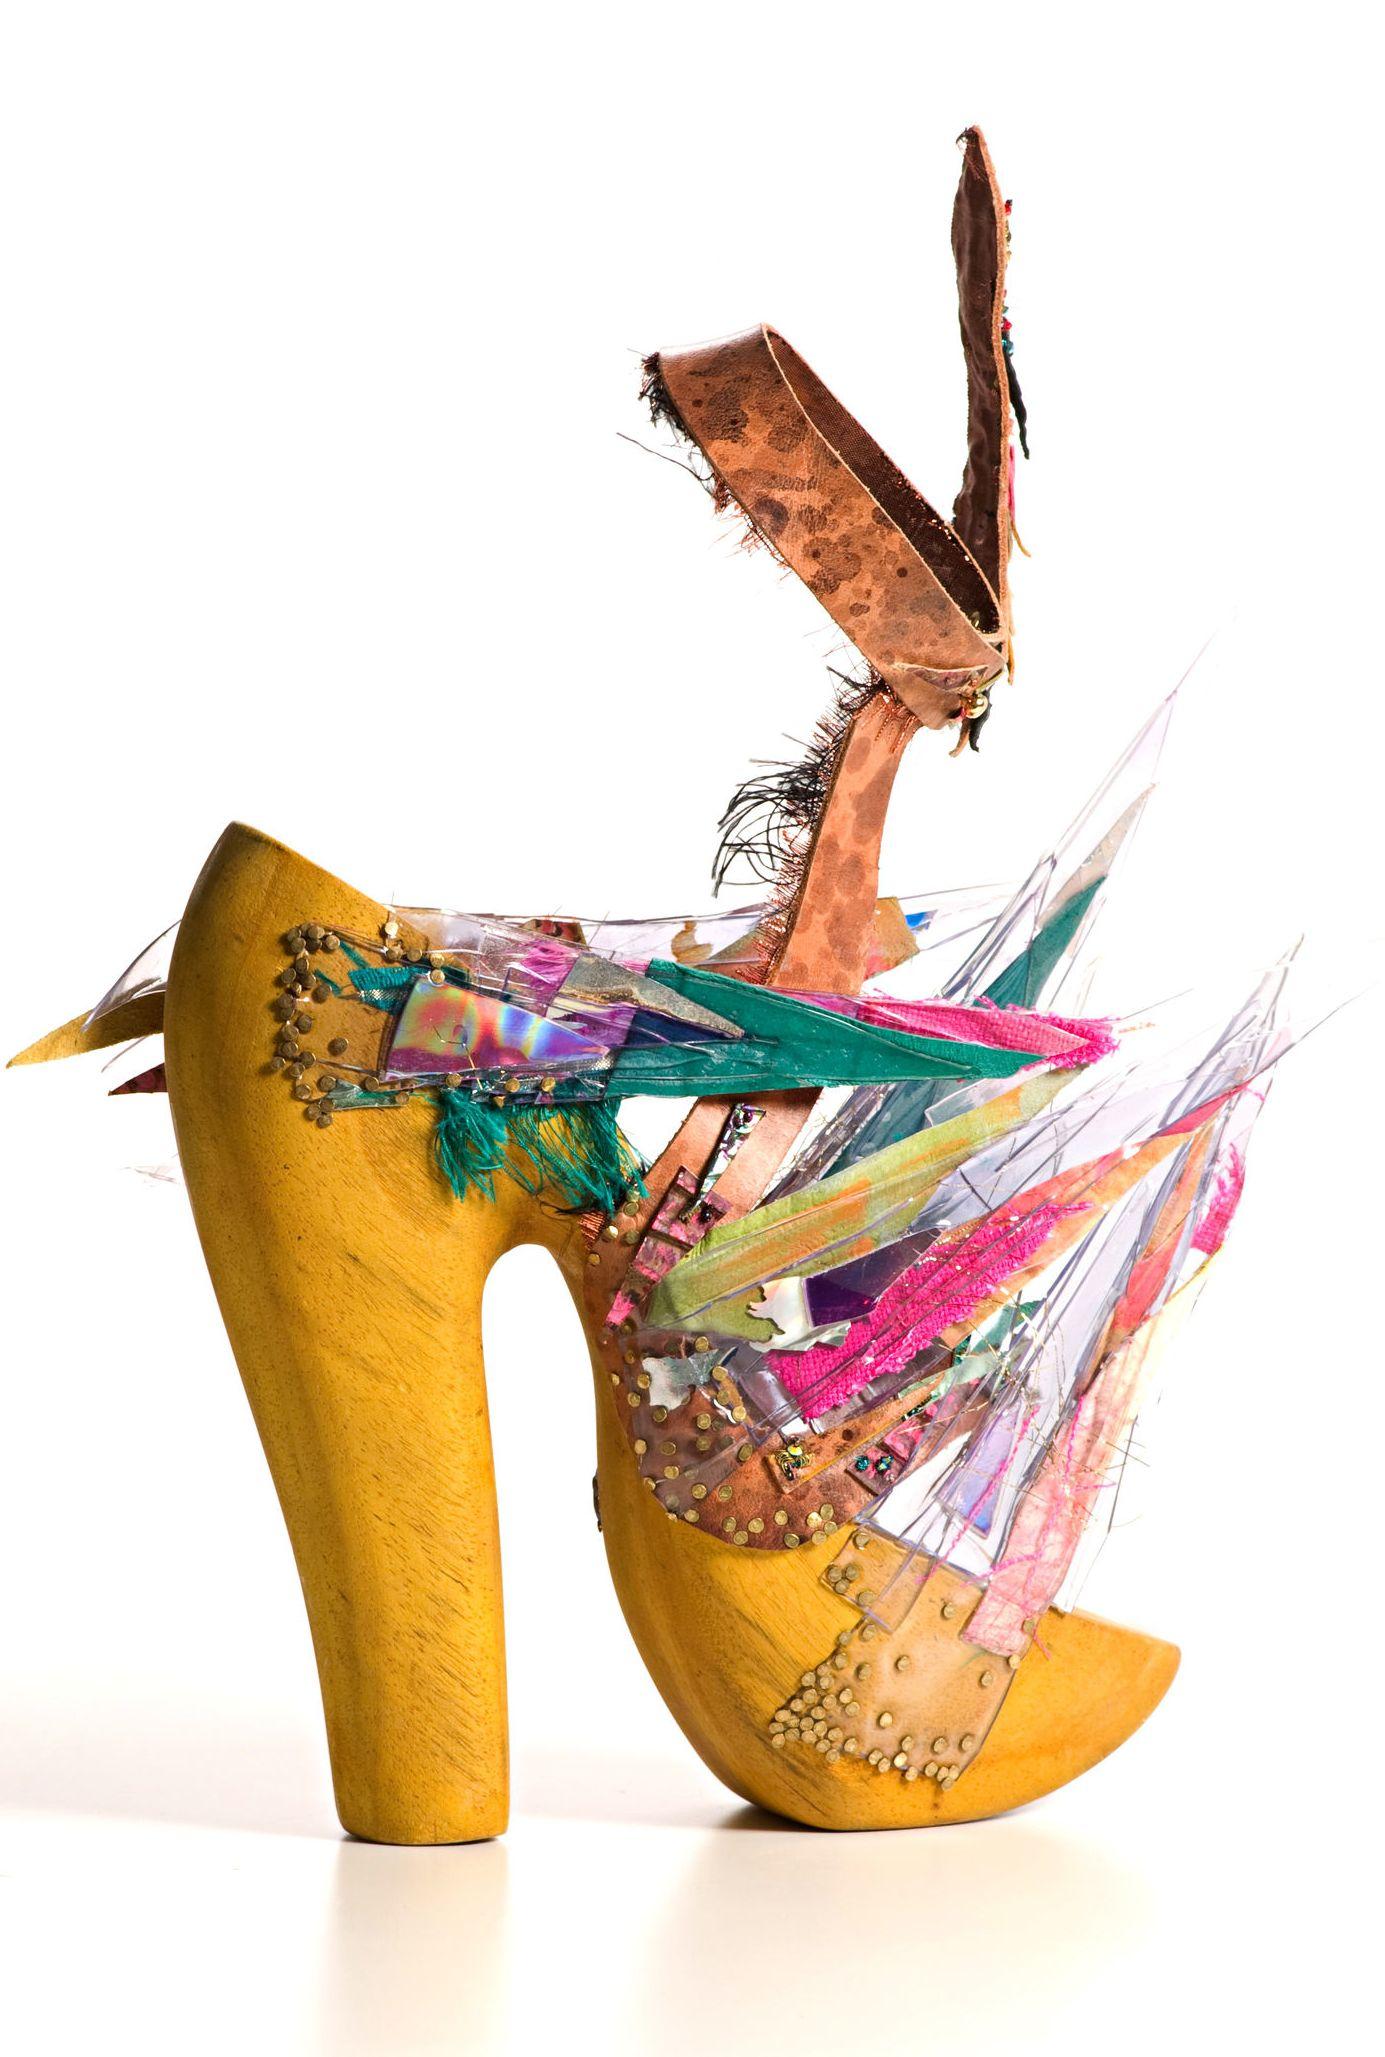 More New Crazy Shoe Designs from Kobi Levi | Zapatos